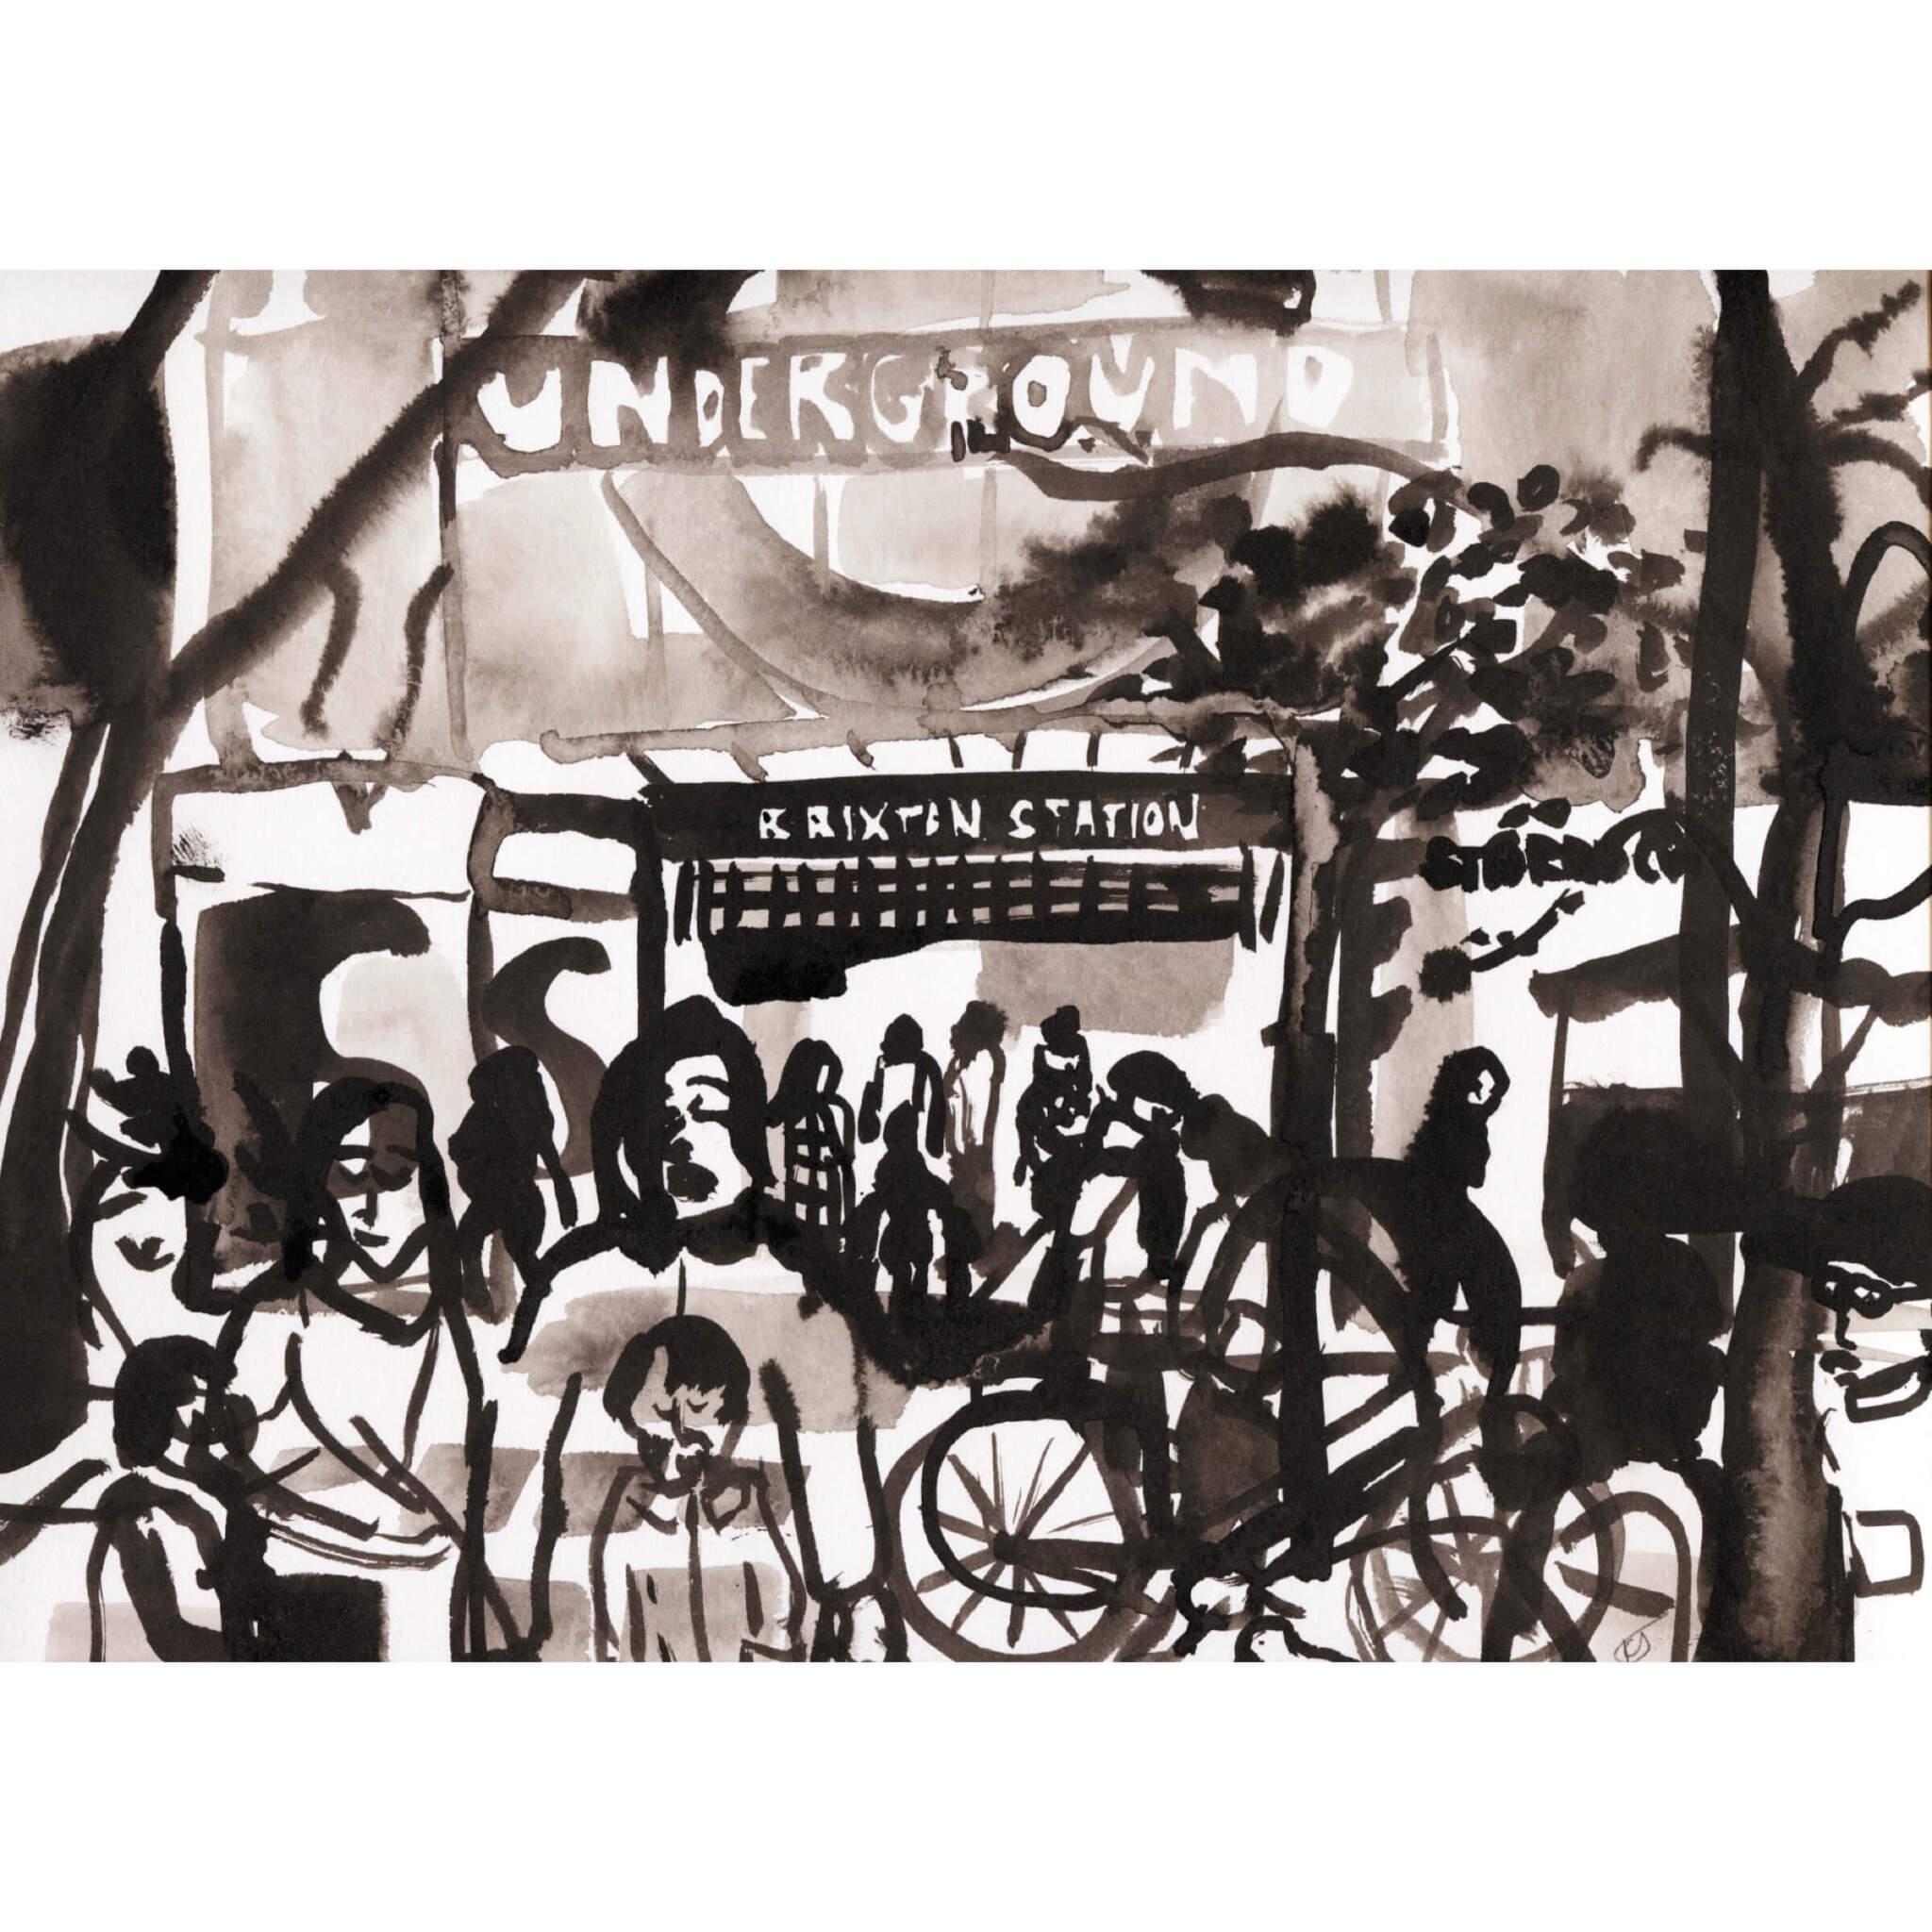 IMG 8755 - Brixton Underground by Kirsty Jones